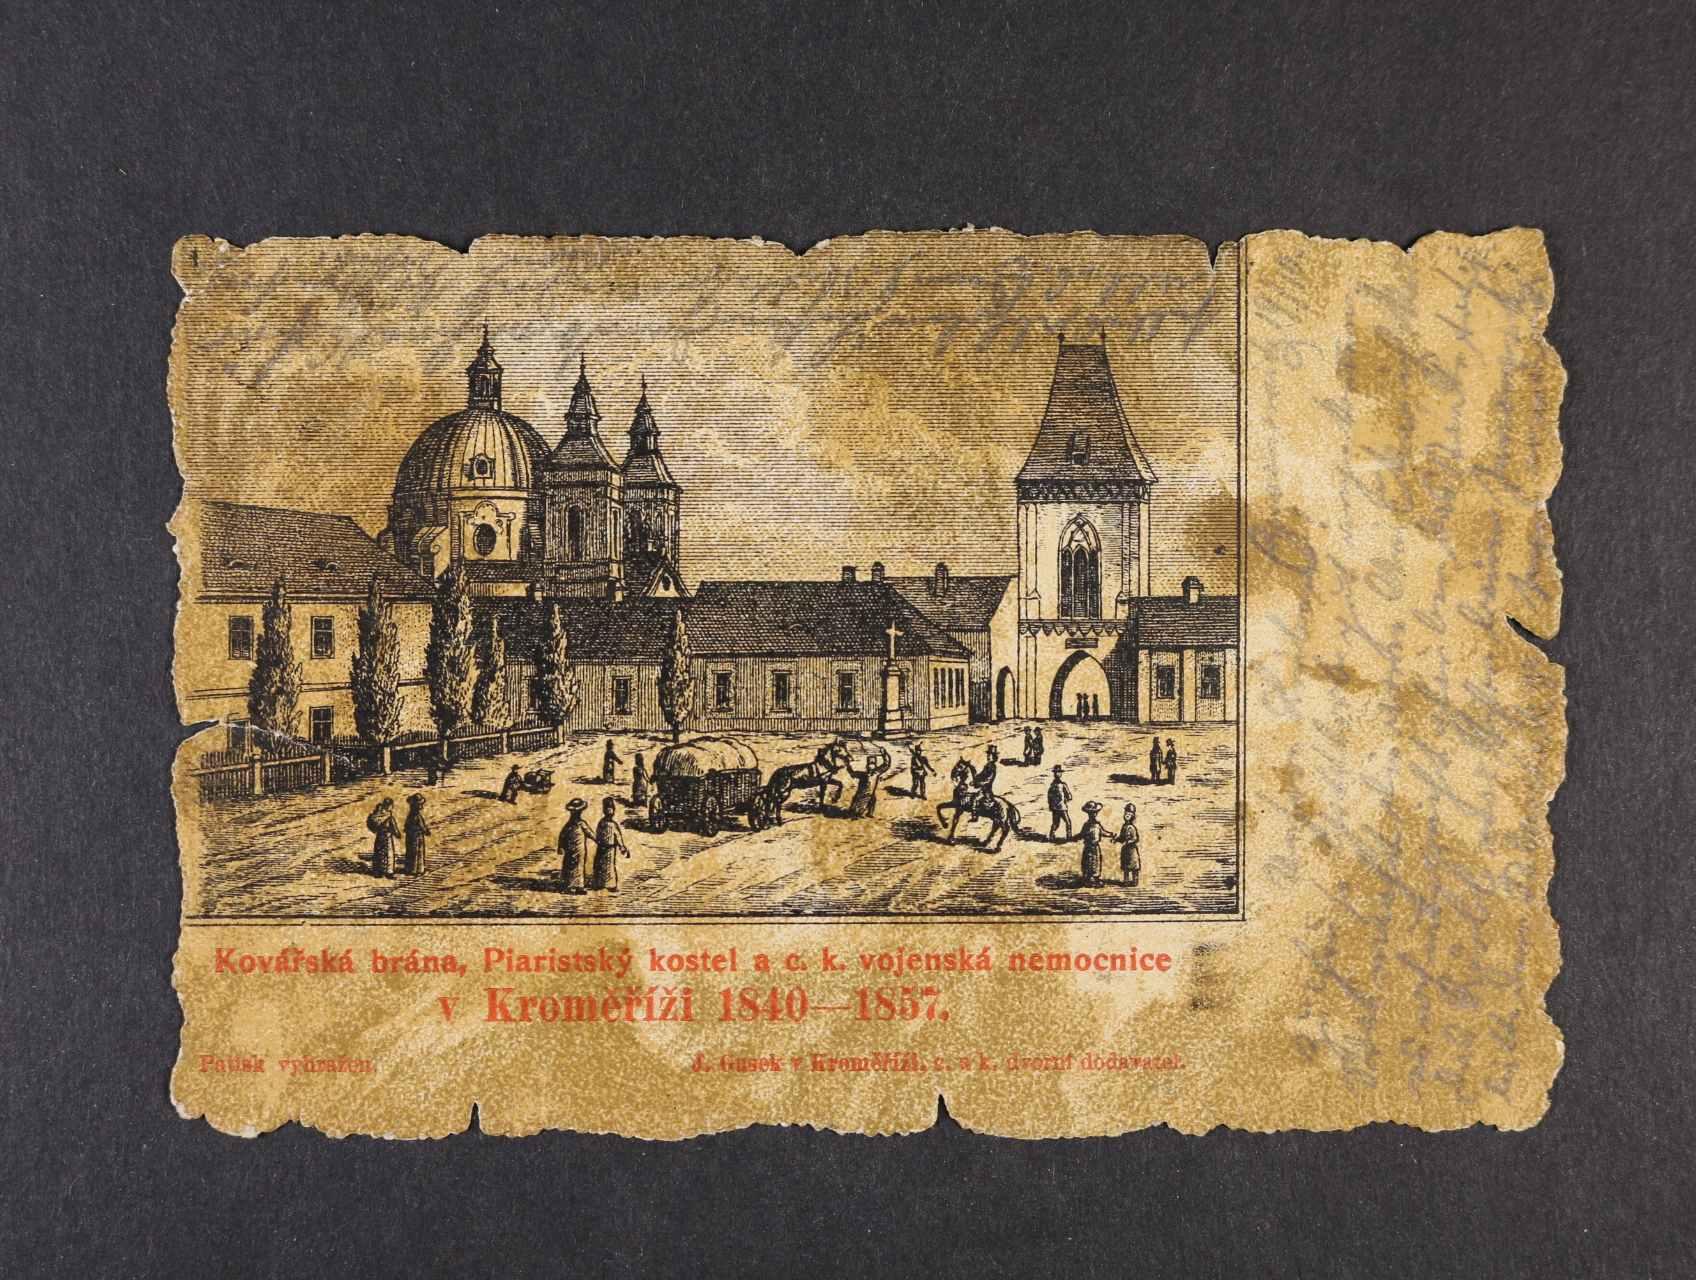 Kroměříž - jednobar. pohlednice použitá 1900 s raz. VLP Brünn - Prerau, dobrá kvalita